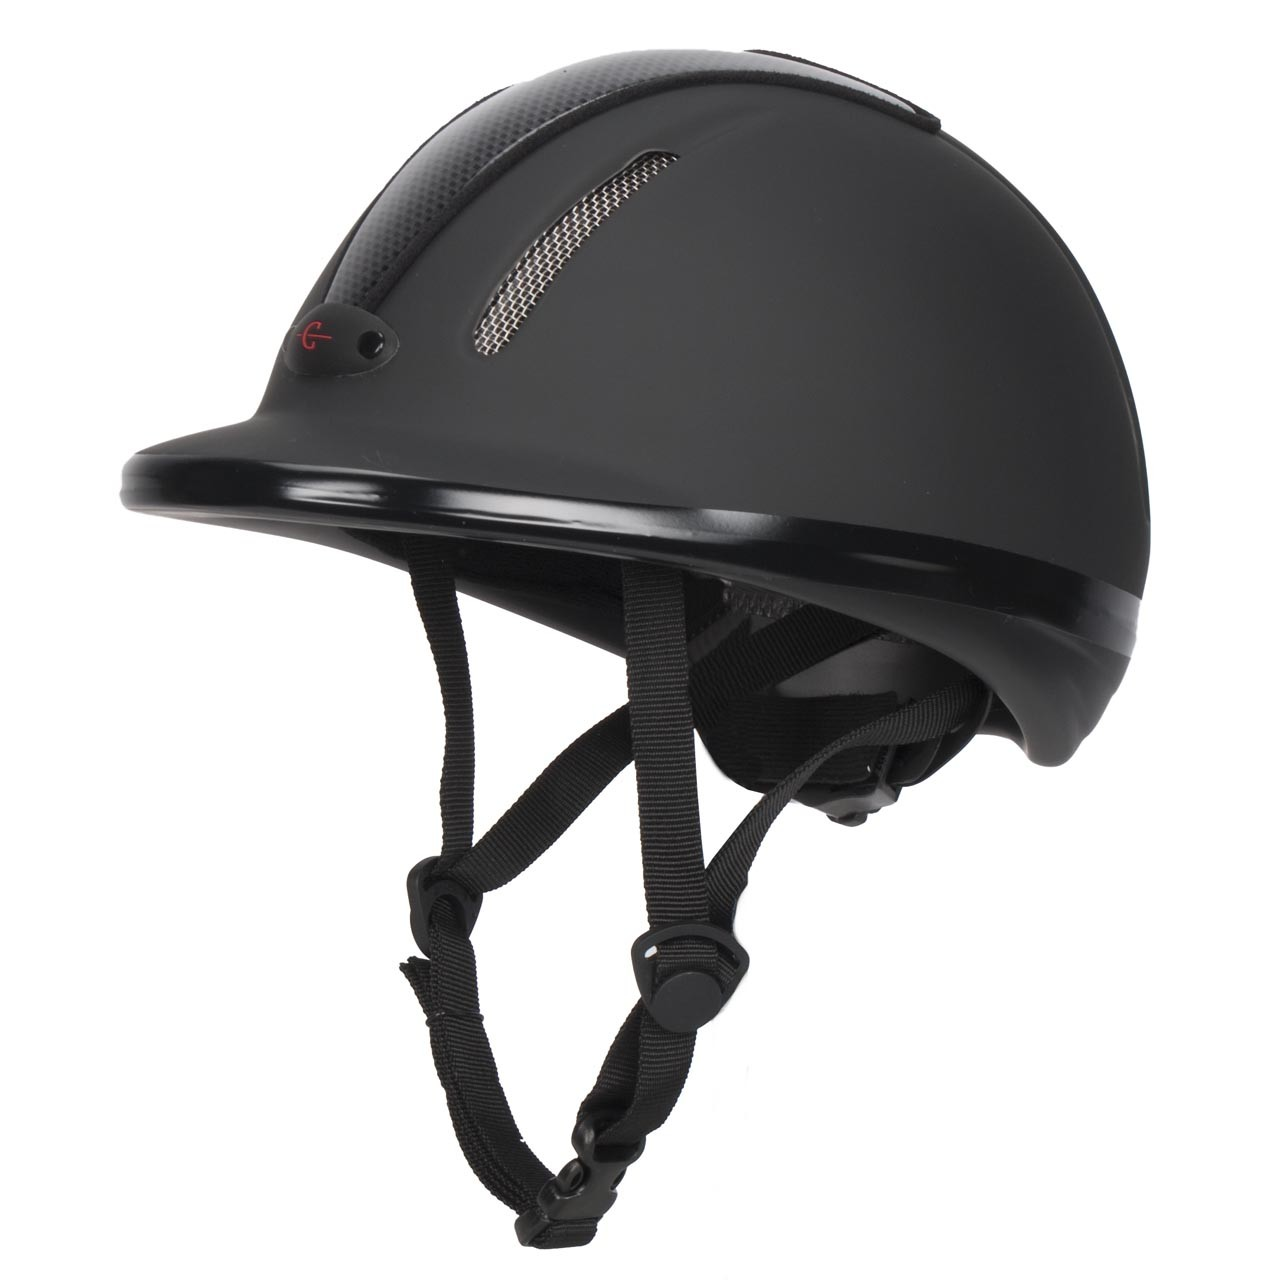 Covalliero Carbonic VG1 cap